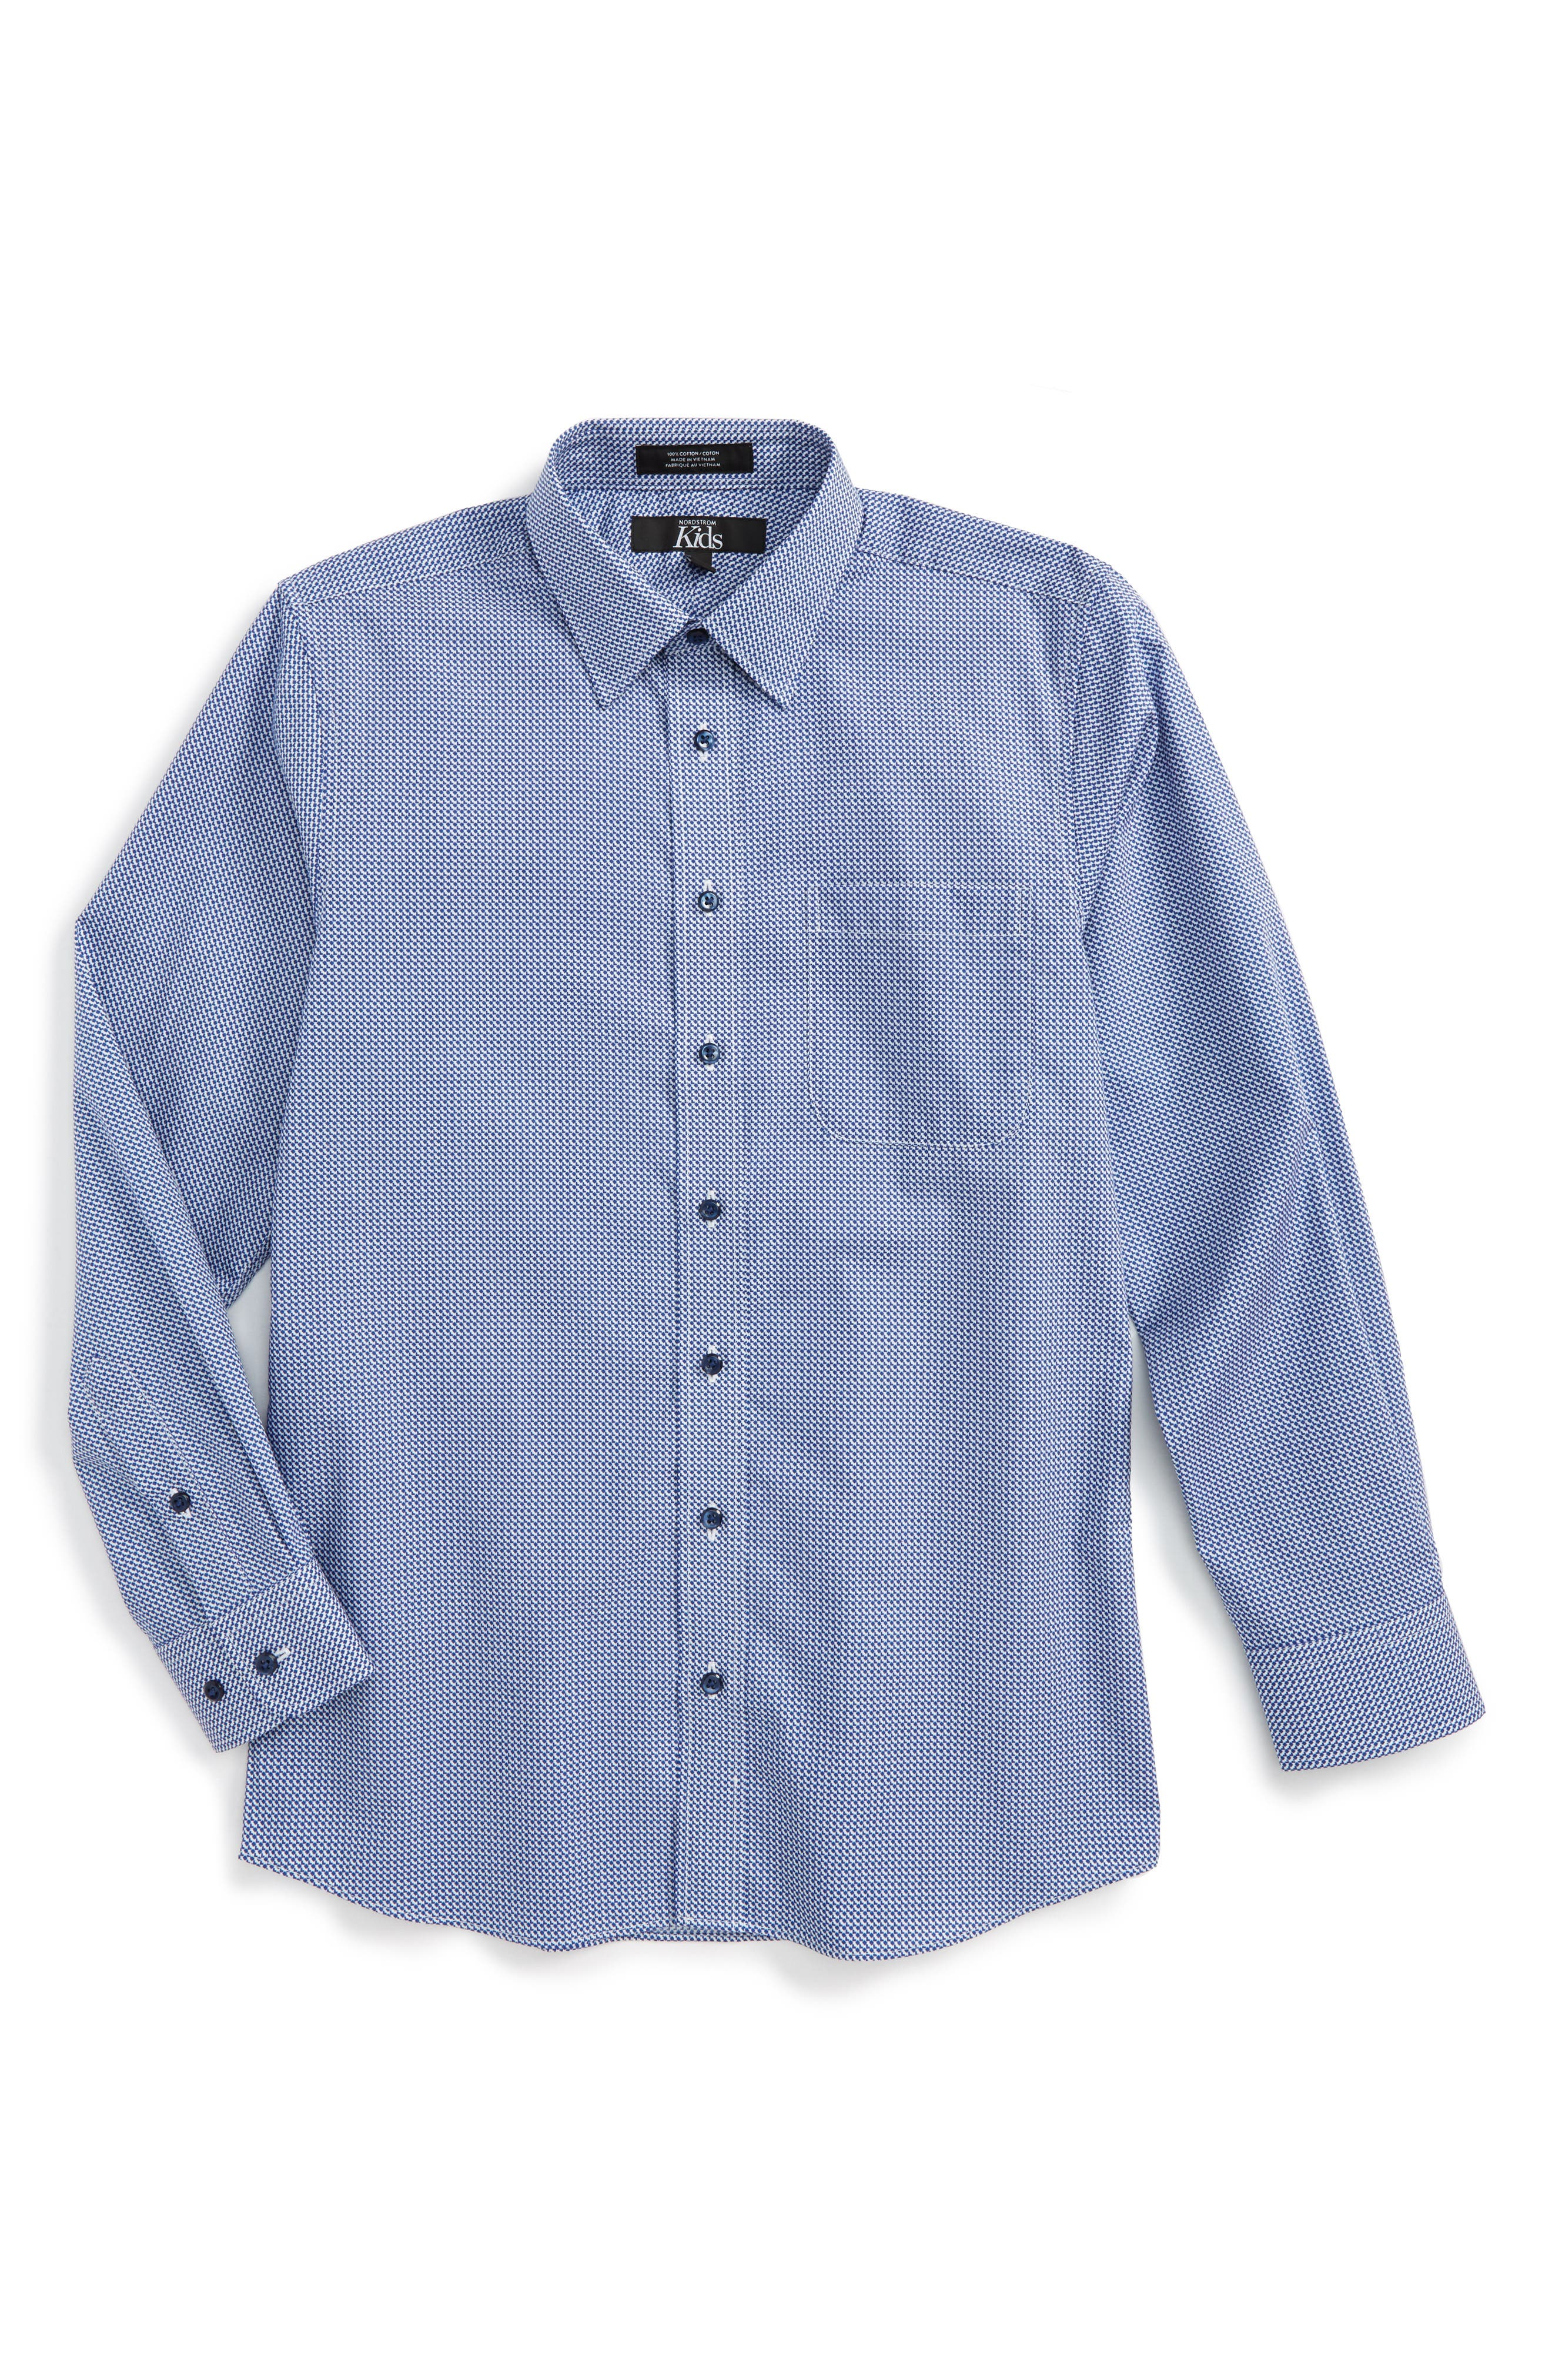 Main Image - Nordstrom Neat Dress Shirt (Big Boys)